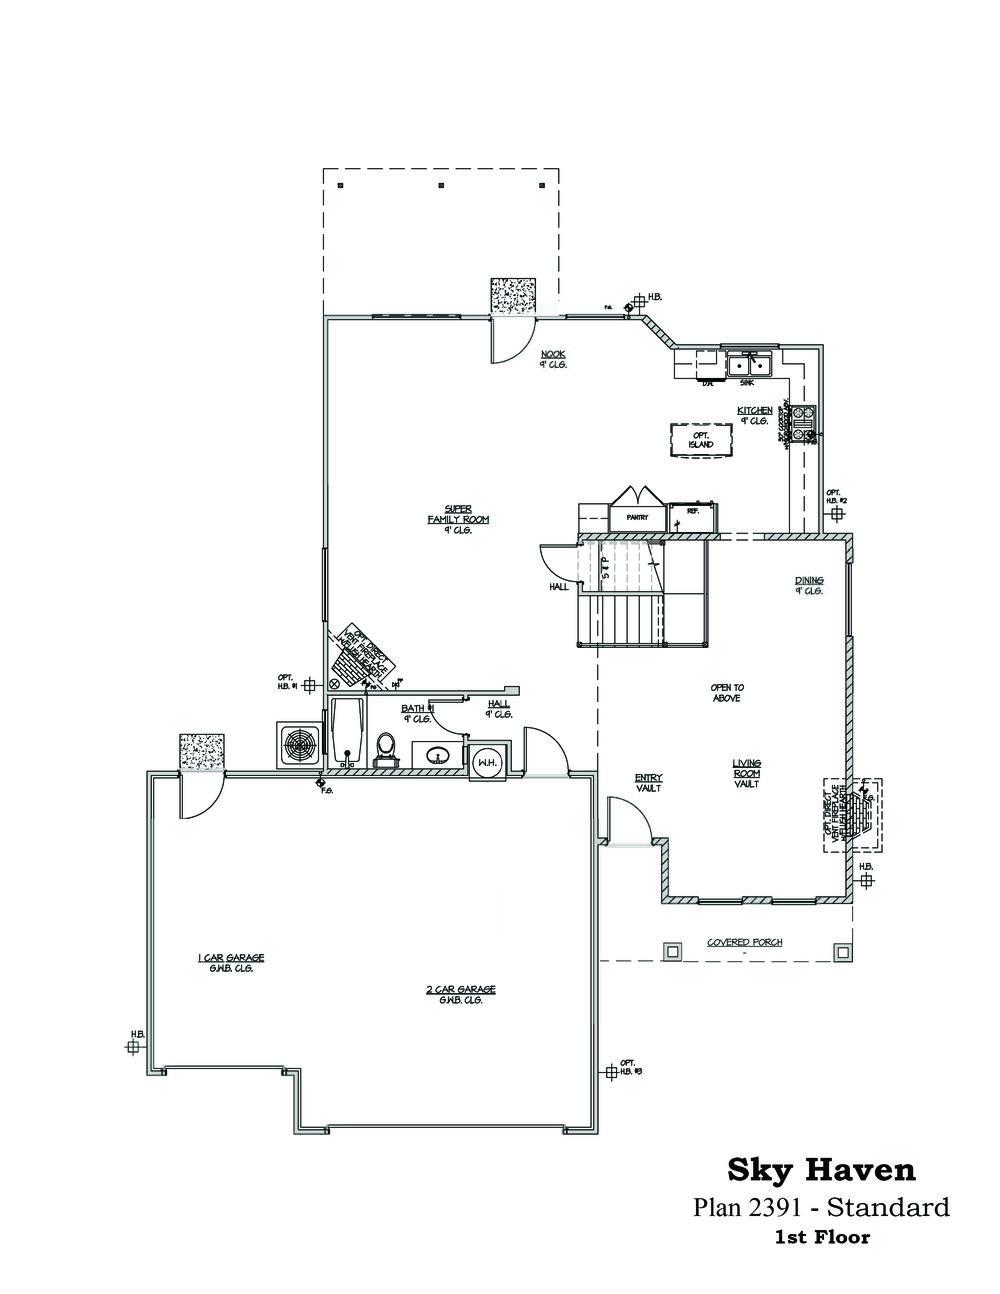 Floorplan_2391_Standard 1st Floor.jpg